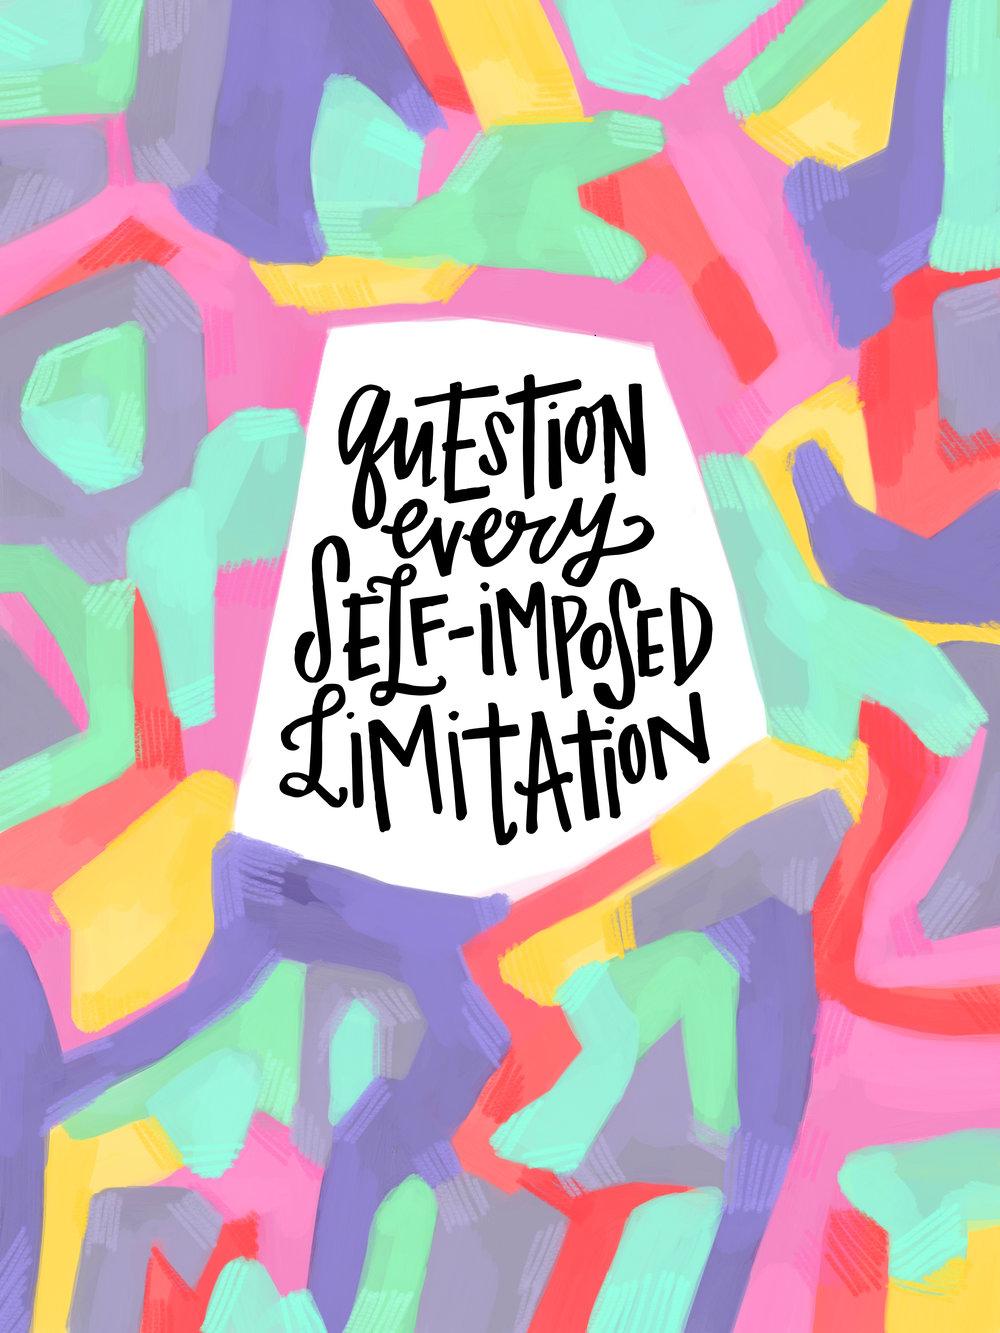 5/14/16: Limitation